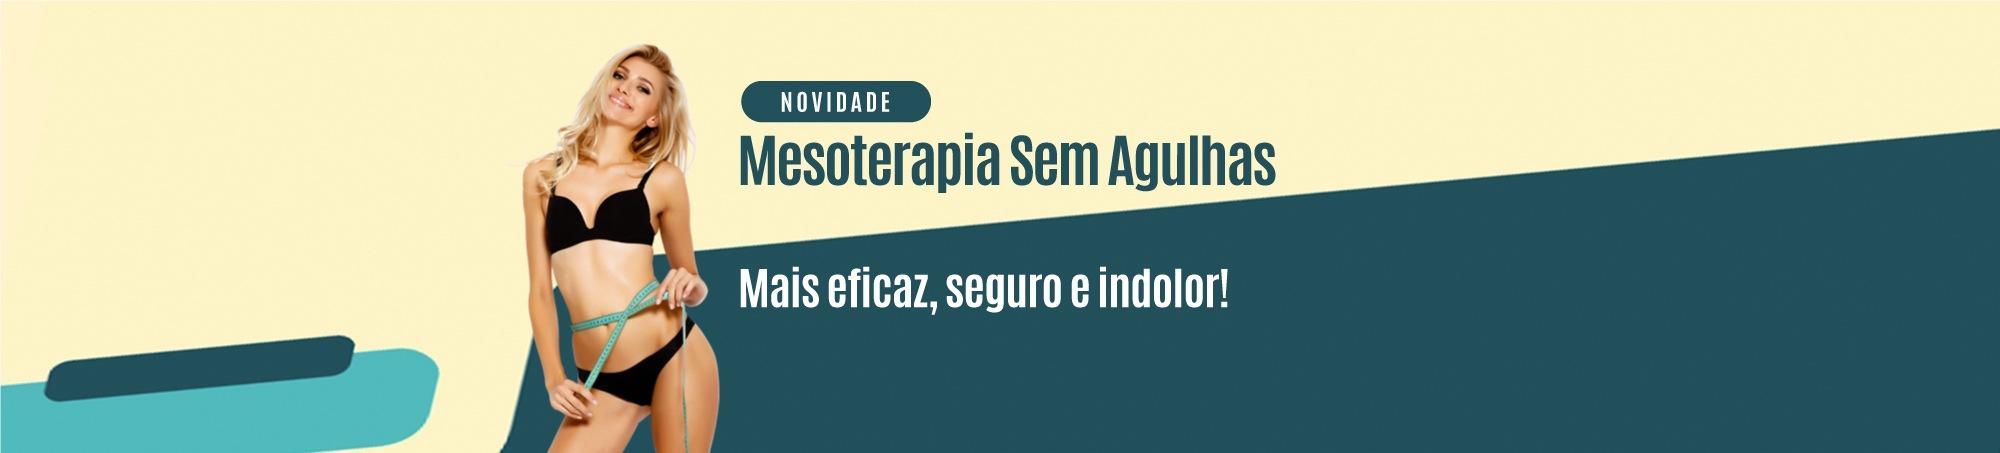 Mesoterapia-sem-agulhas-1